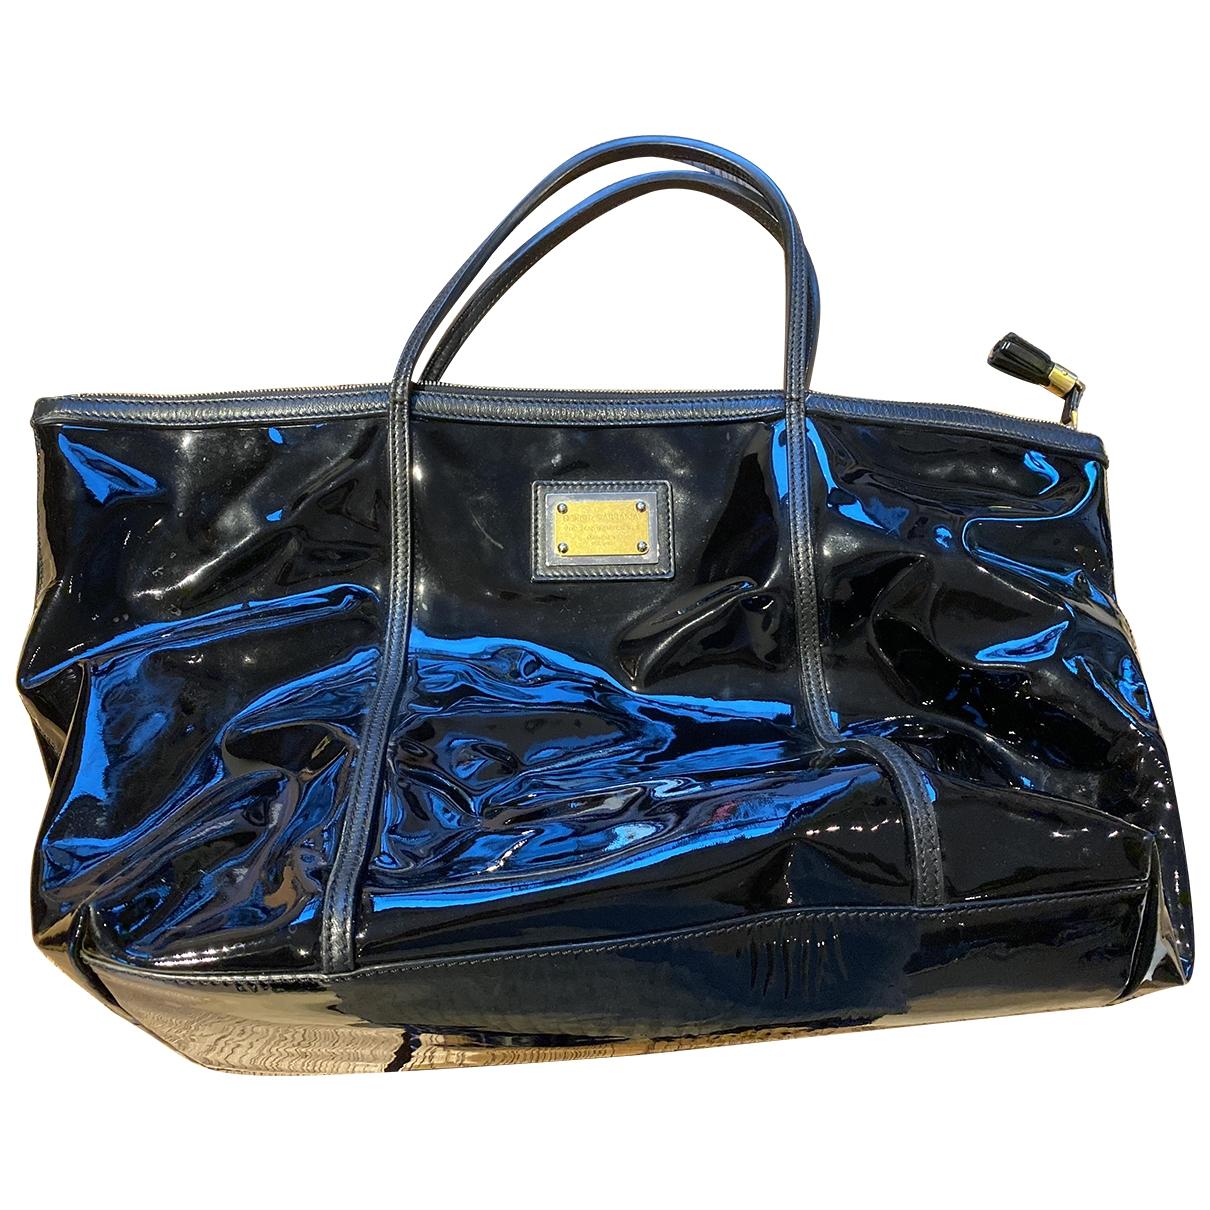 Dolce & Gabbana \N Black Patent leather handbag for Women \N